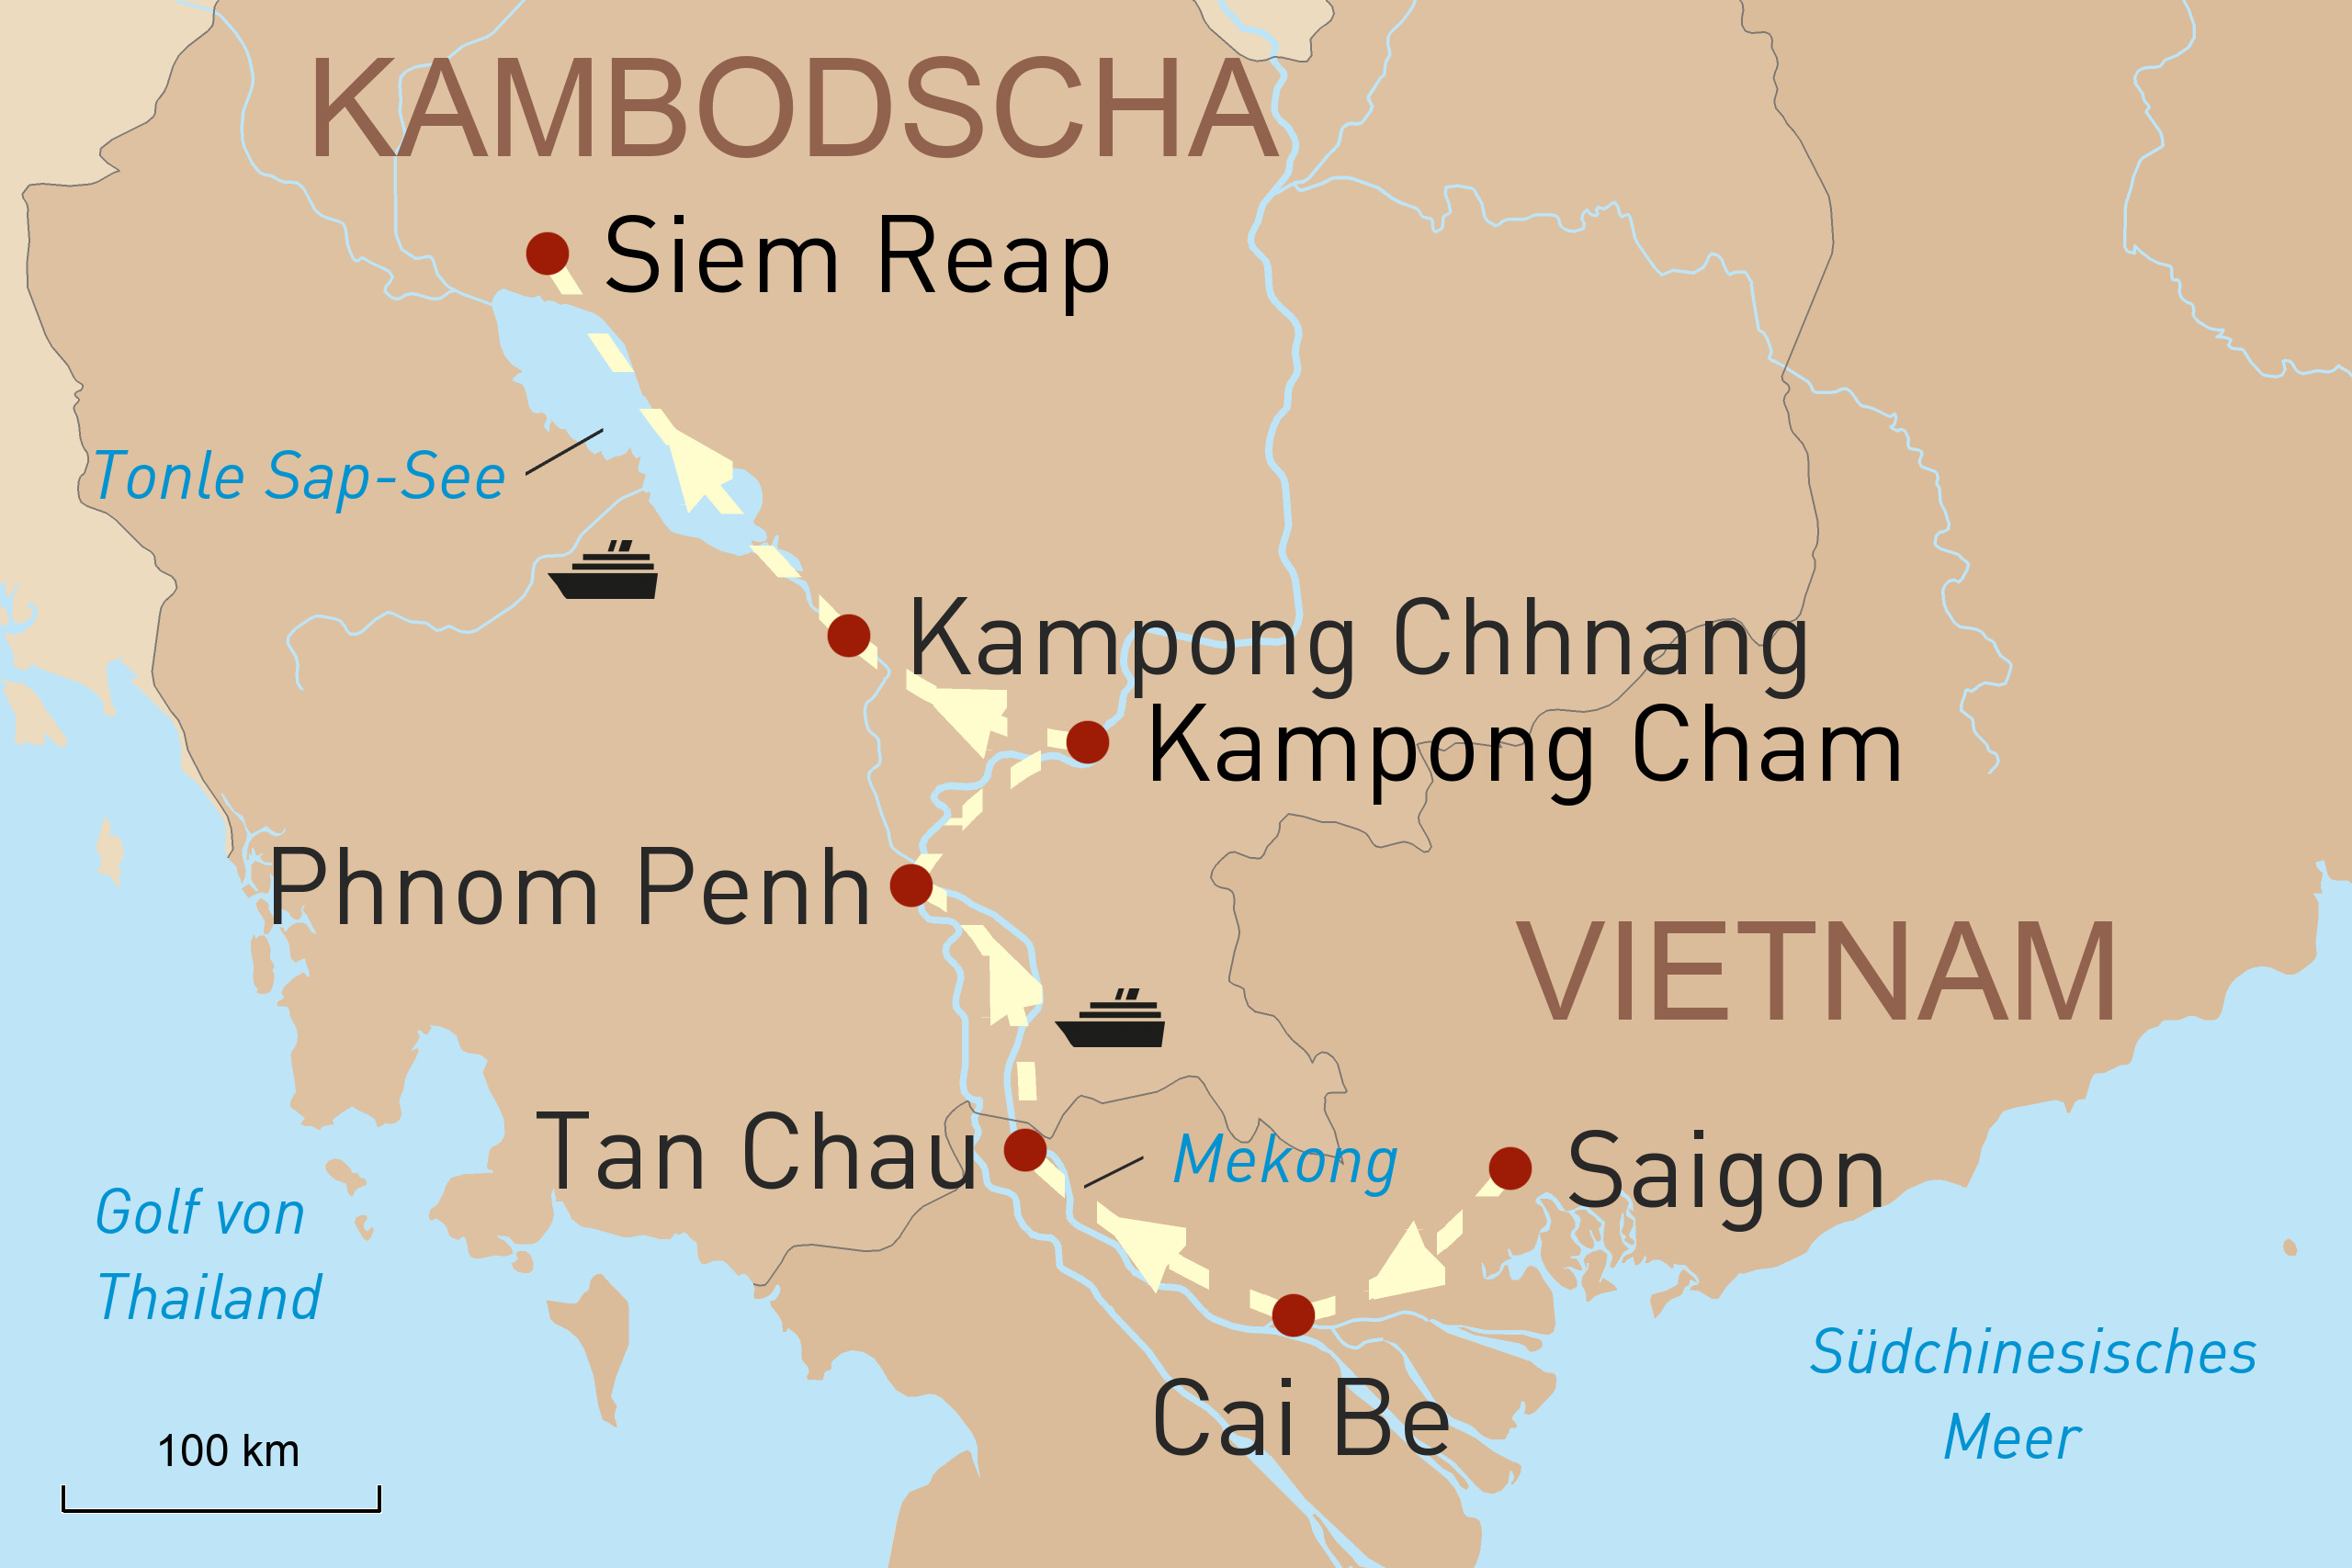 Lebensader Mekong und Tonle Sap-See